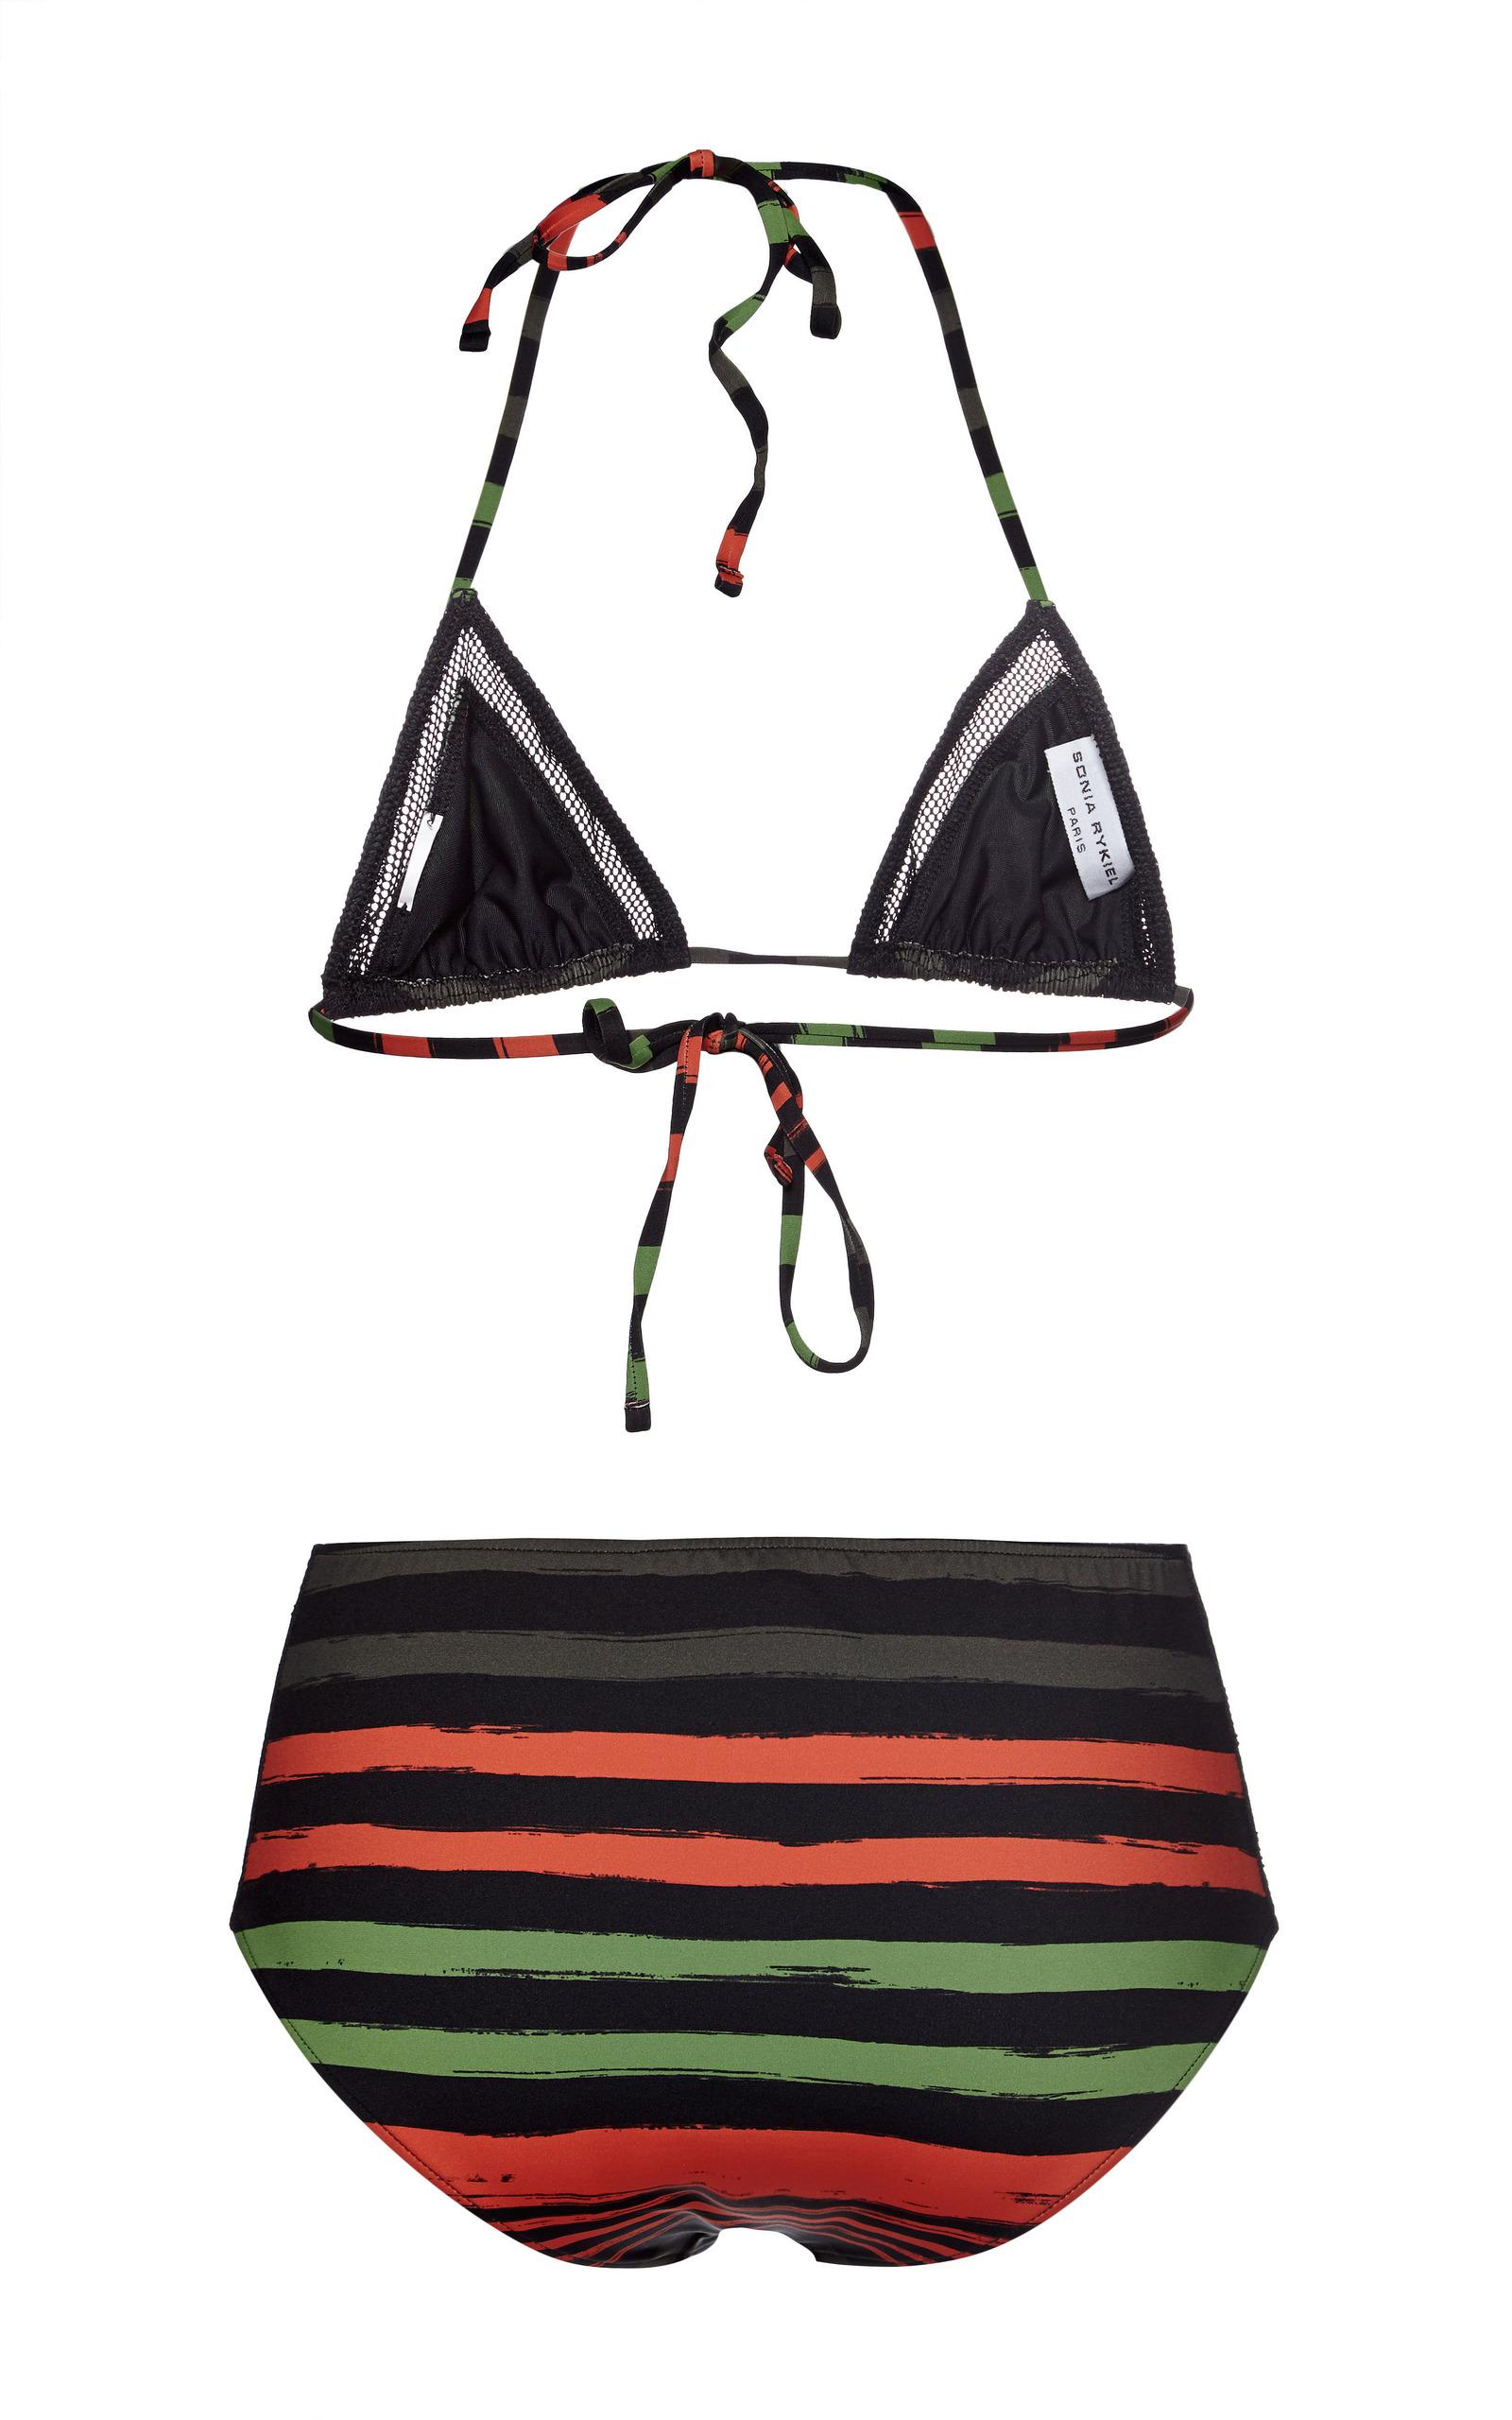 56cd24a70c1 Sonia RykielBlack Tangerine Striped Mesh Beachwear Bikini Top. CLOSE.  Loading